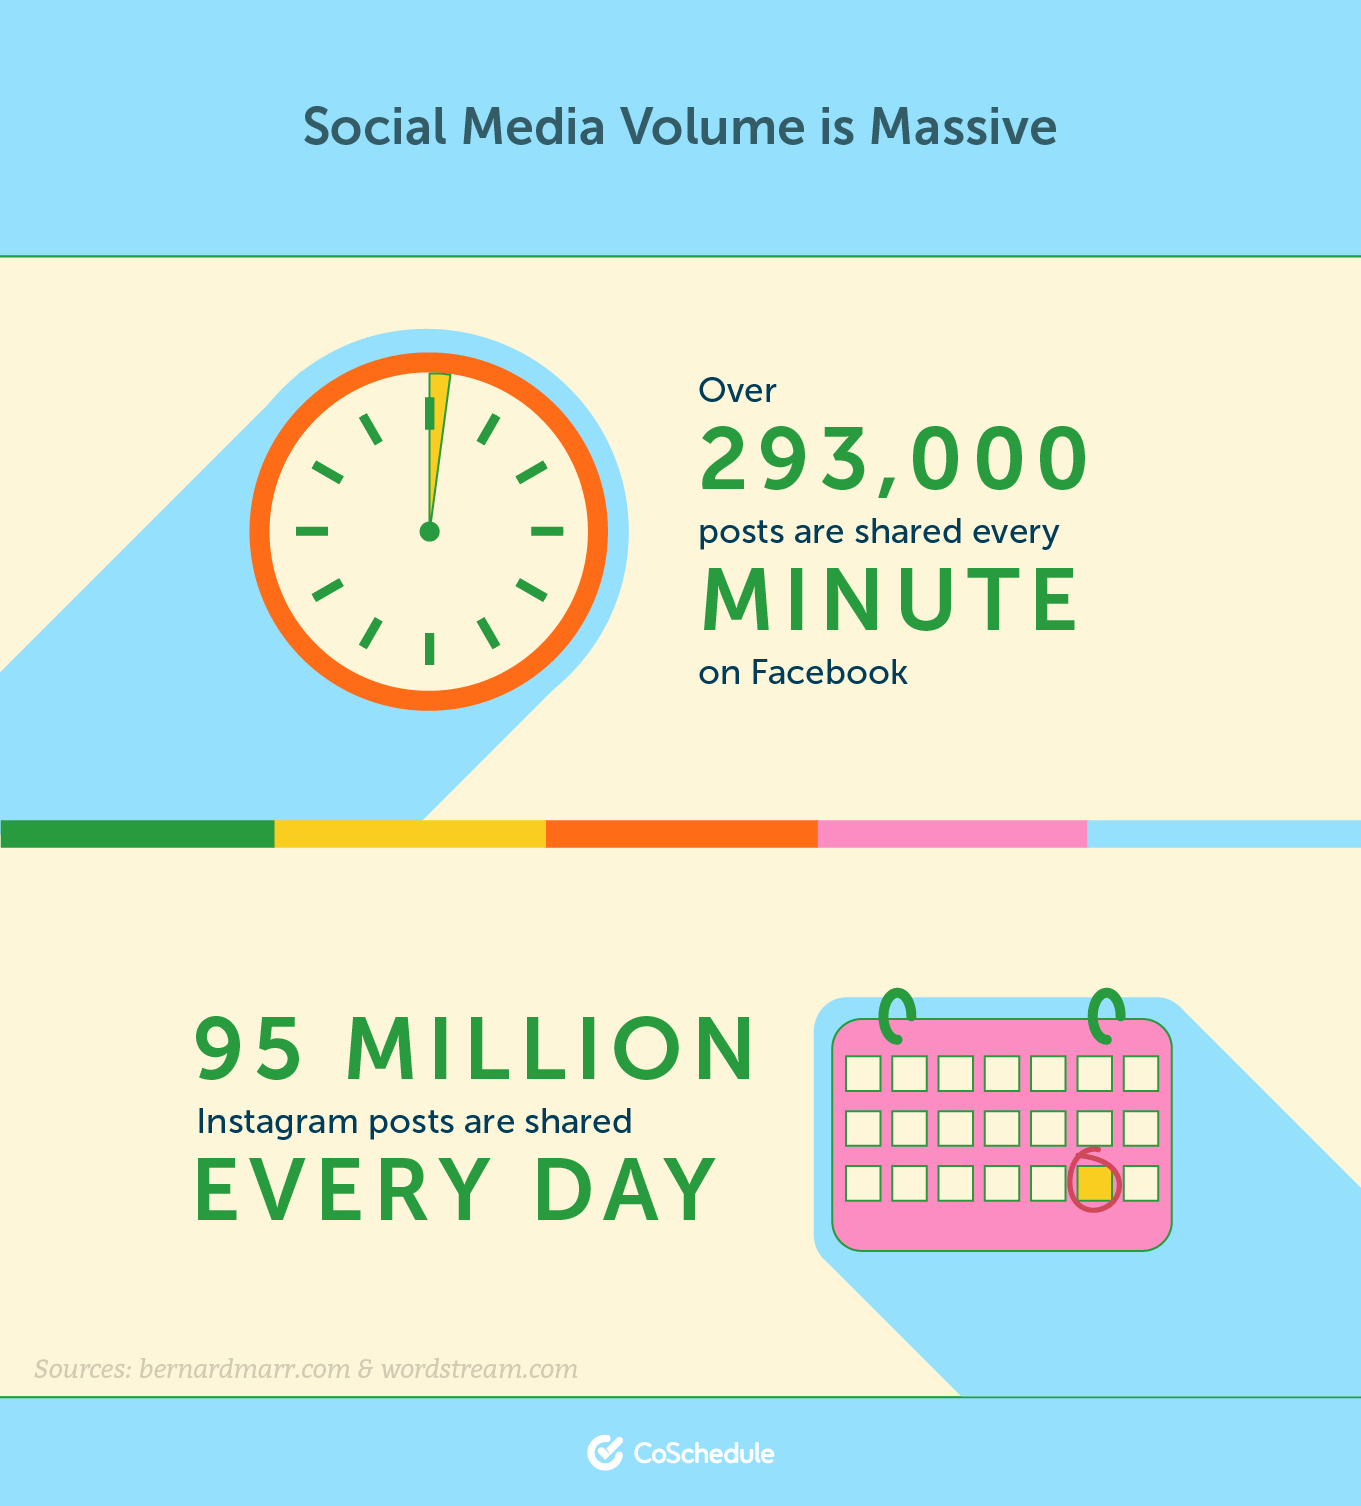 Social media volume is massive